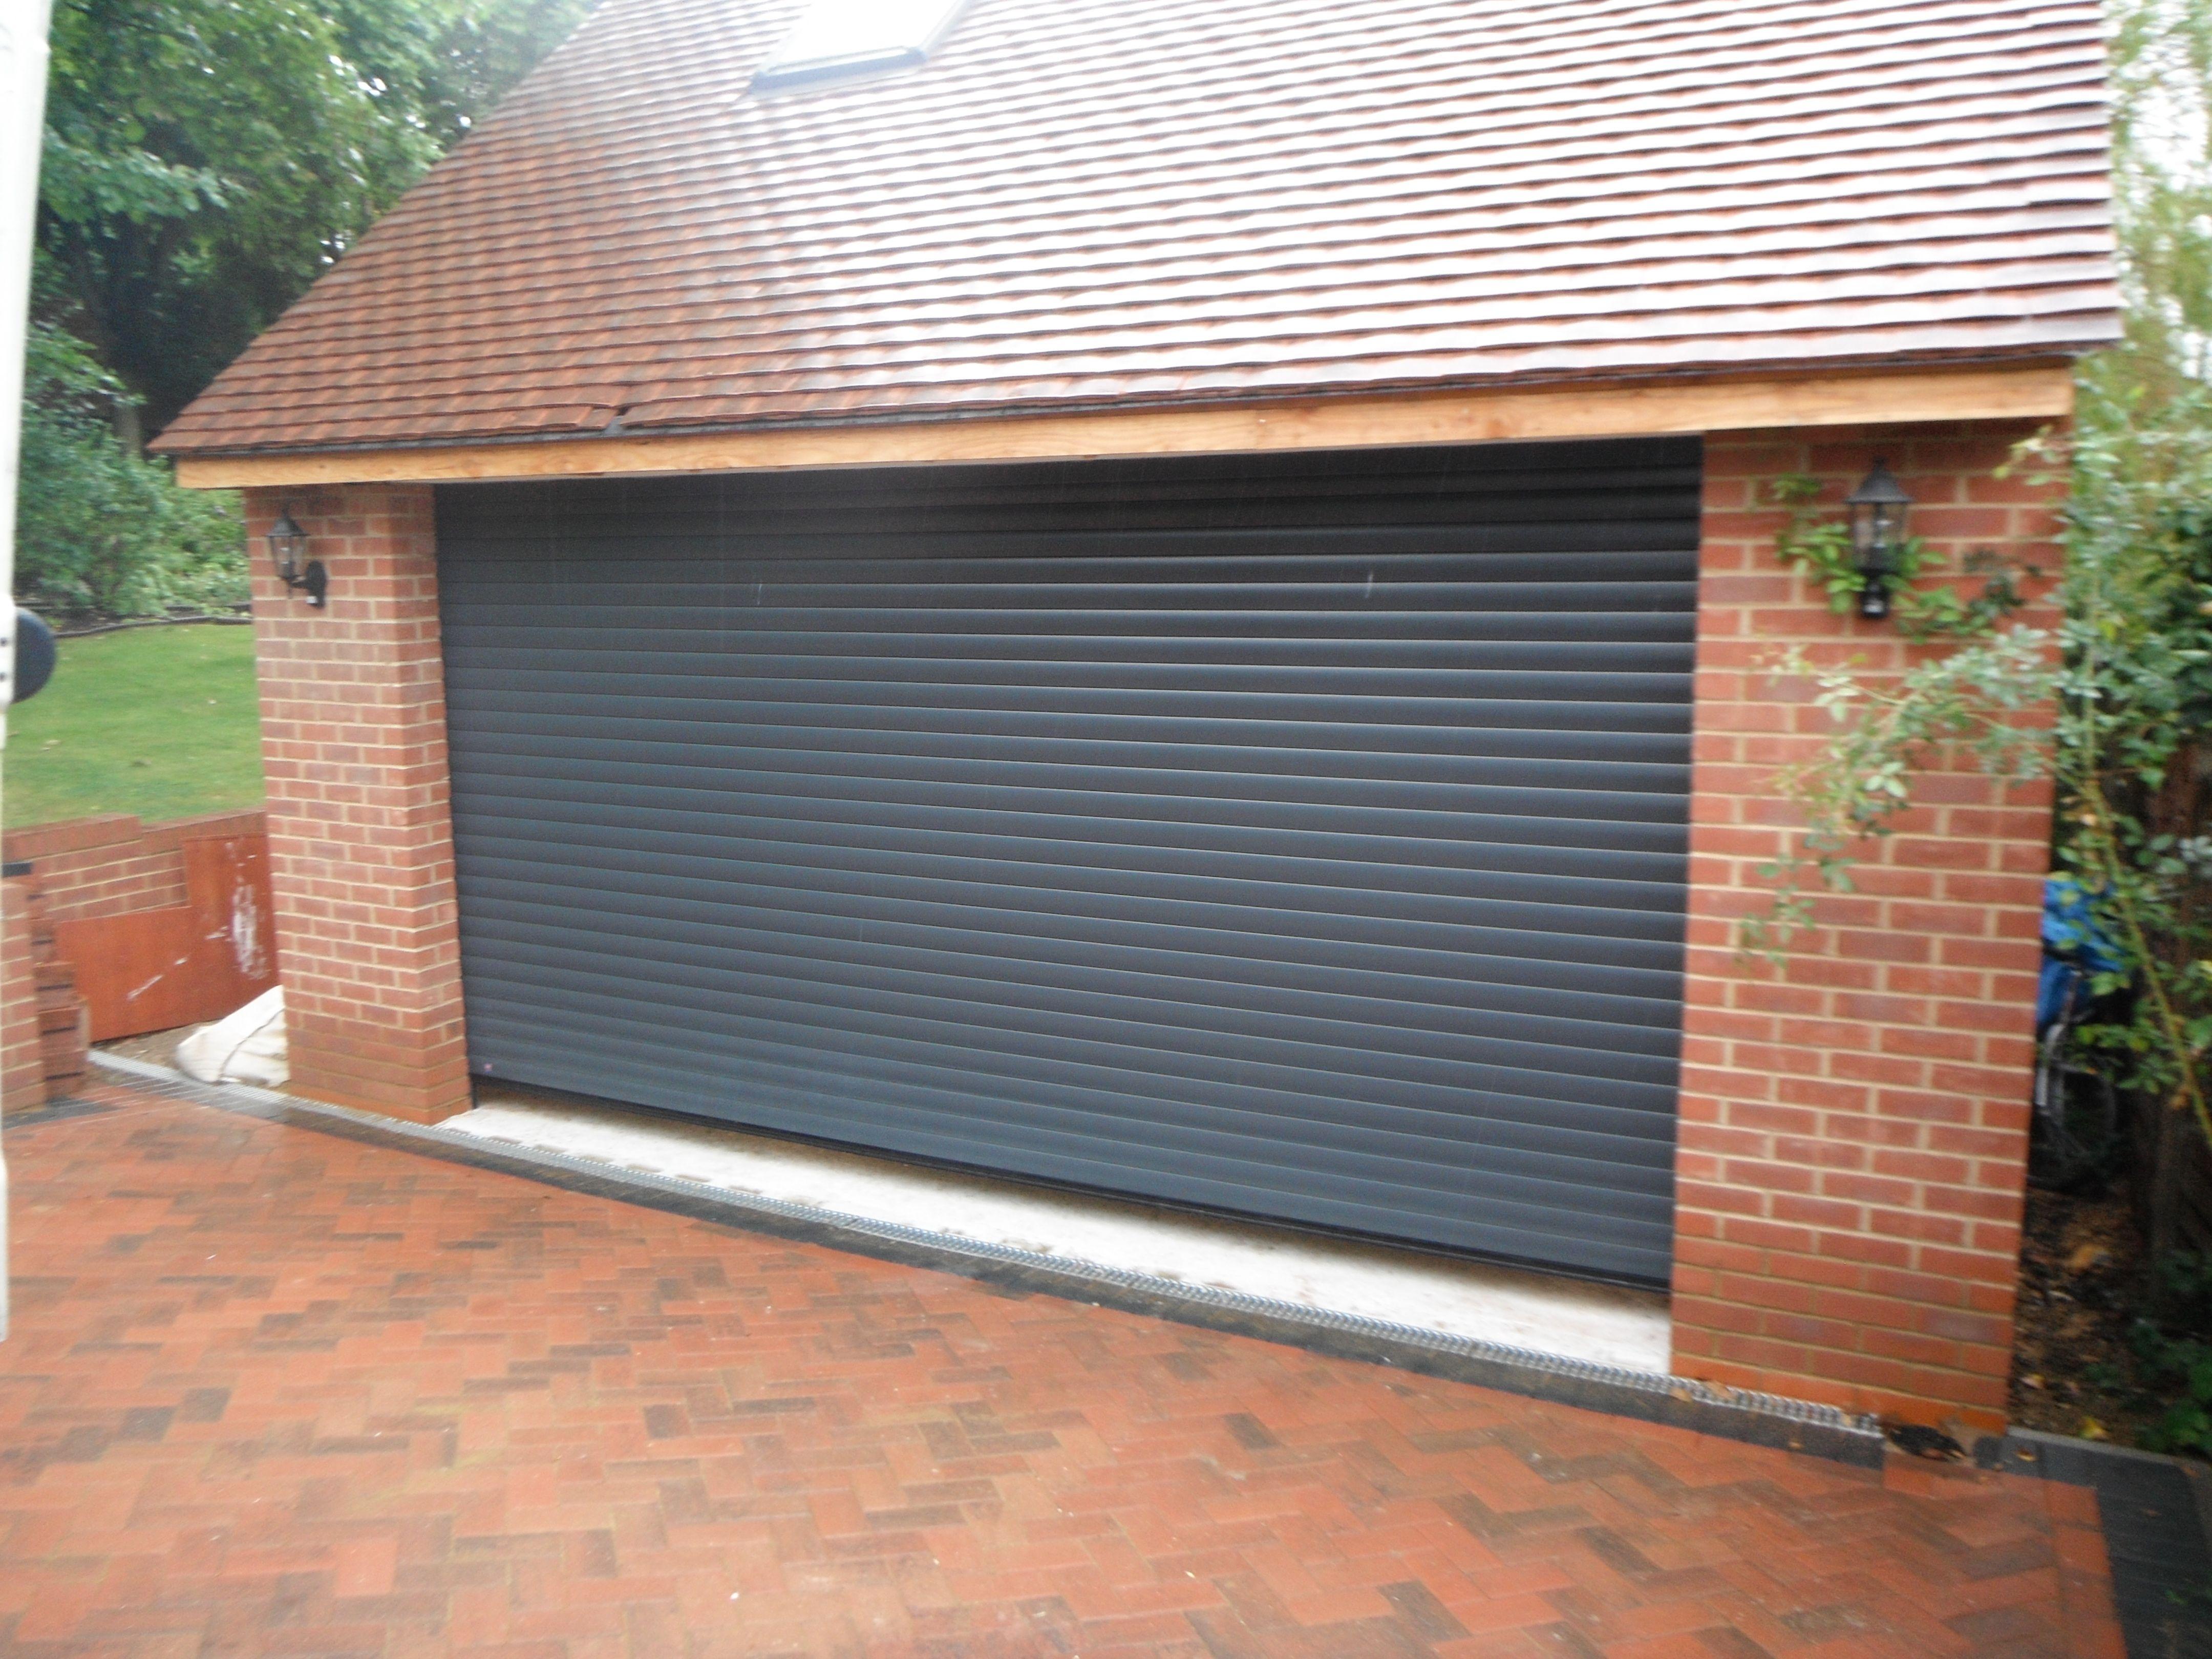 ne lincoln garage installation wi size wichita ocala opener overhead campbell repair of door madison fl ca ks full